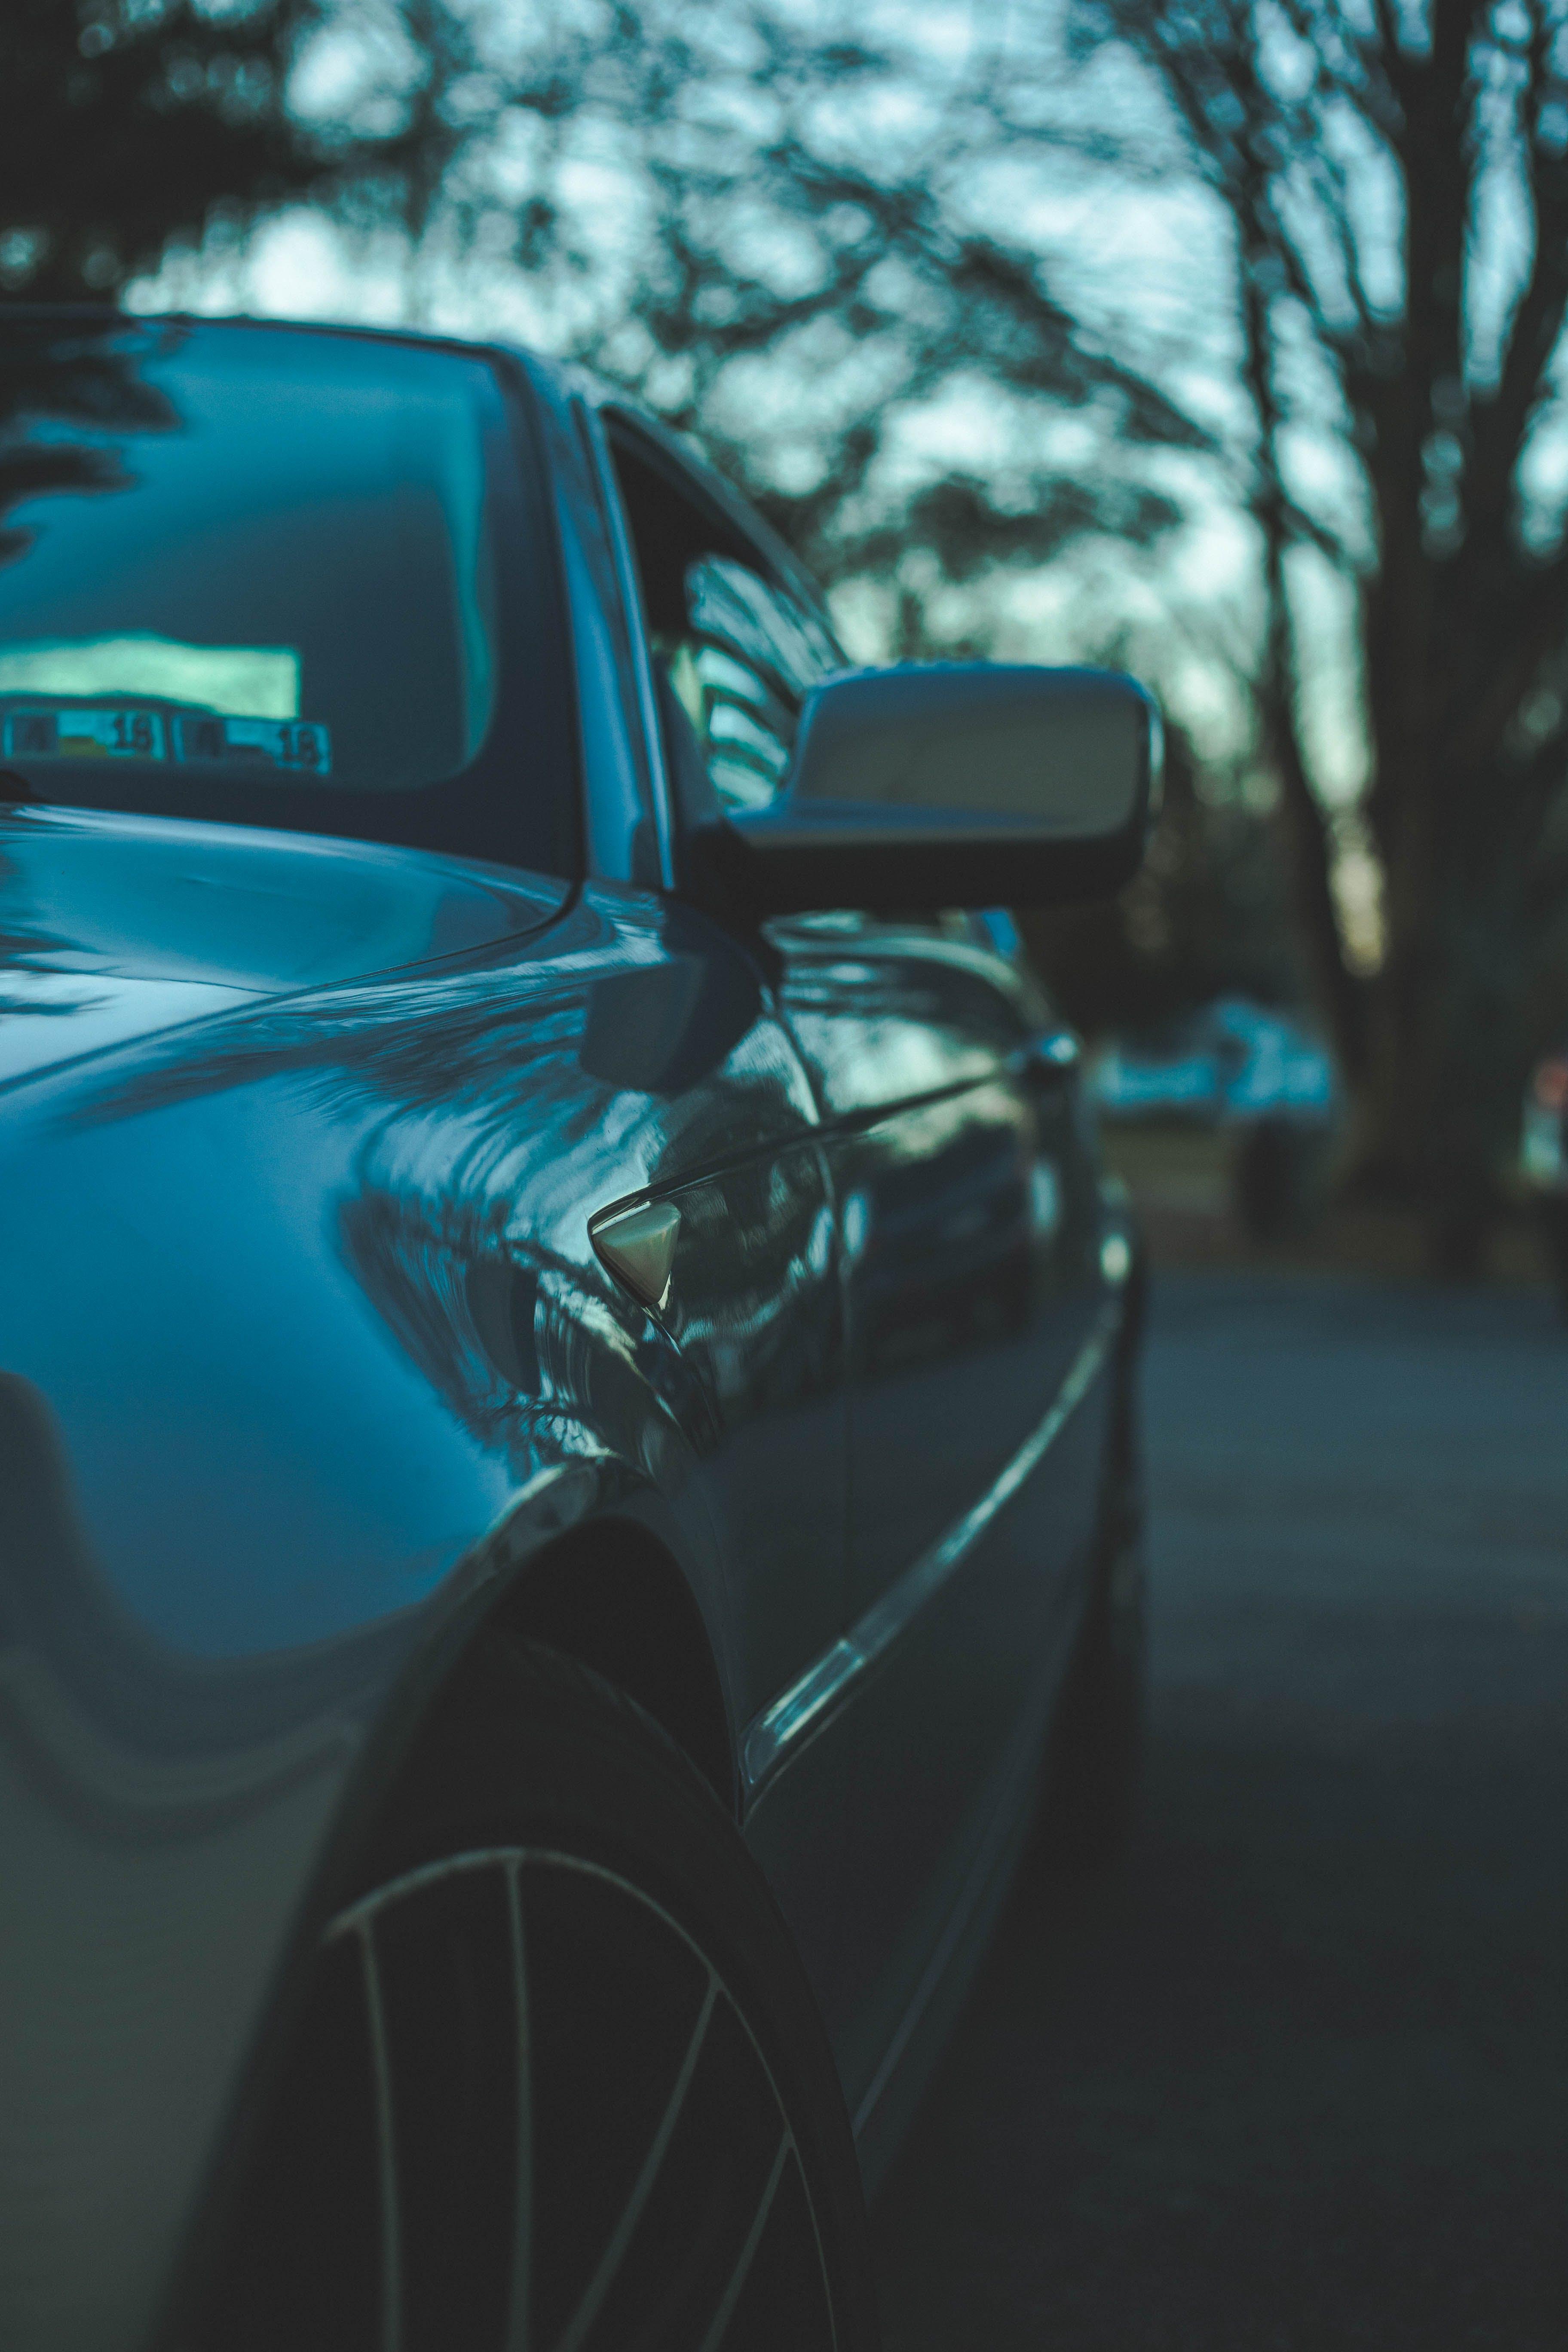 Gratis stockfoto met auto, close-up, reflectie, sportauto